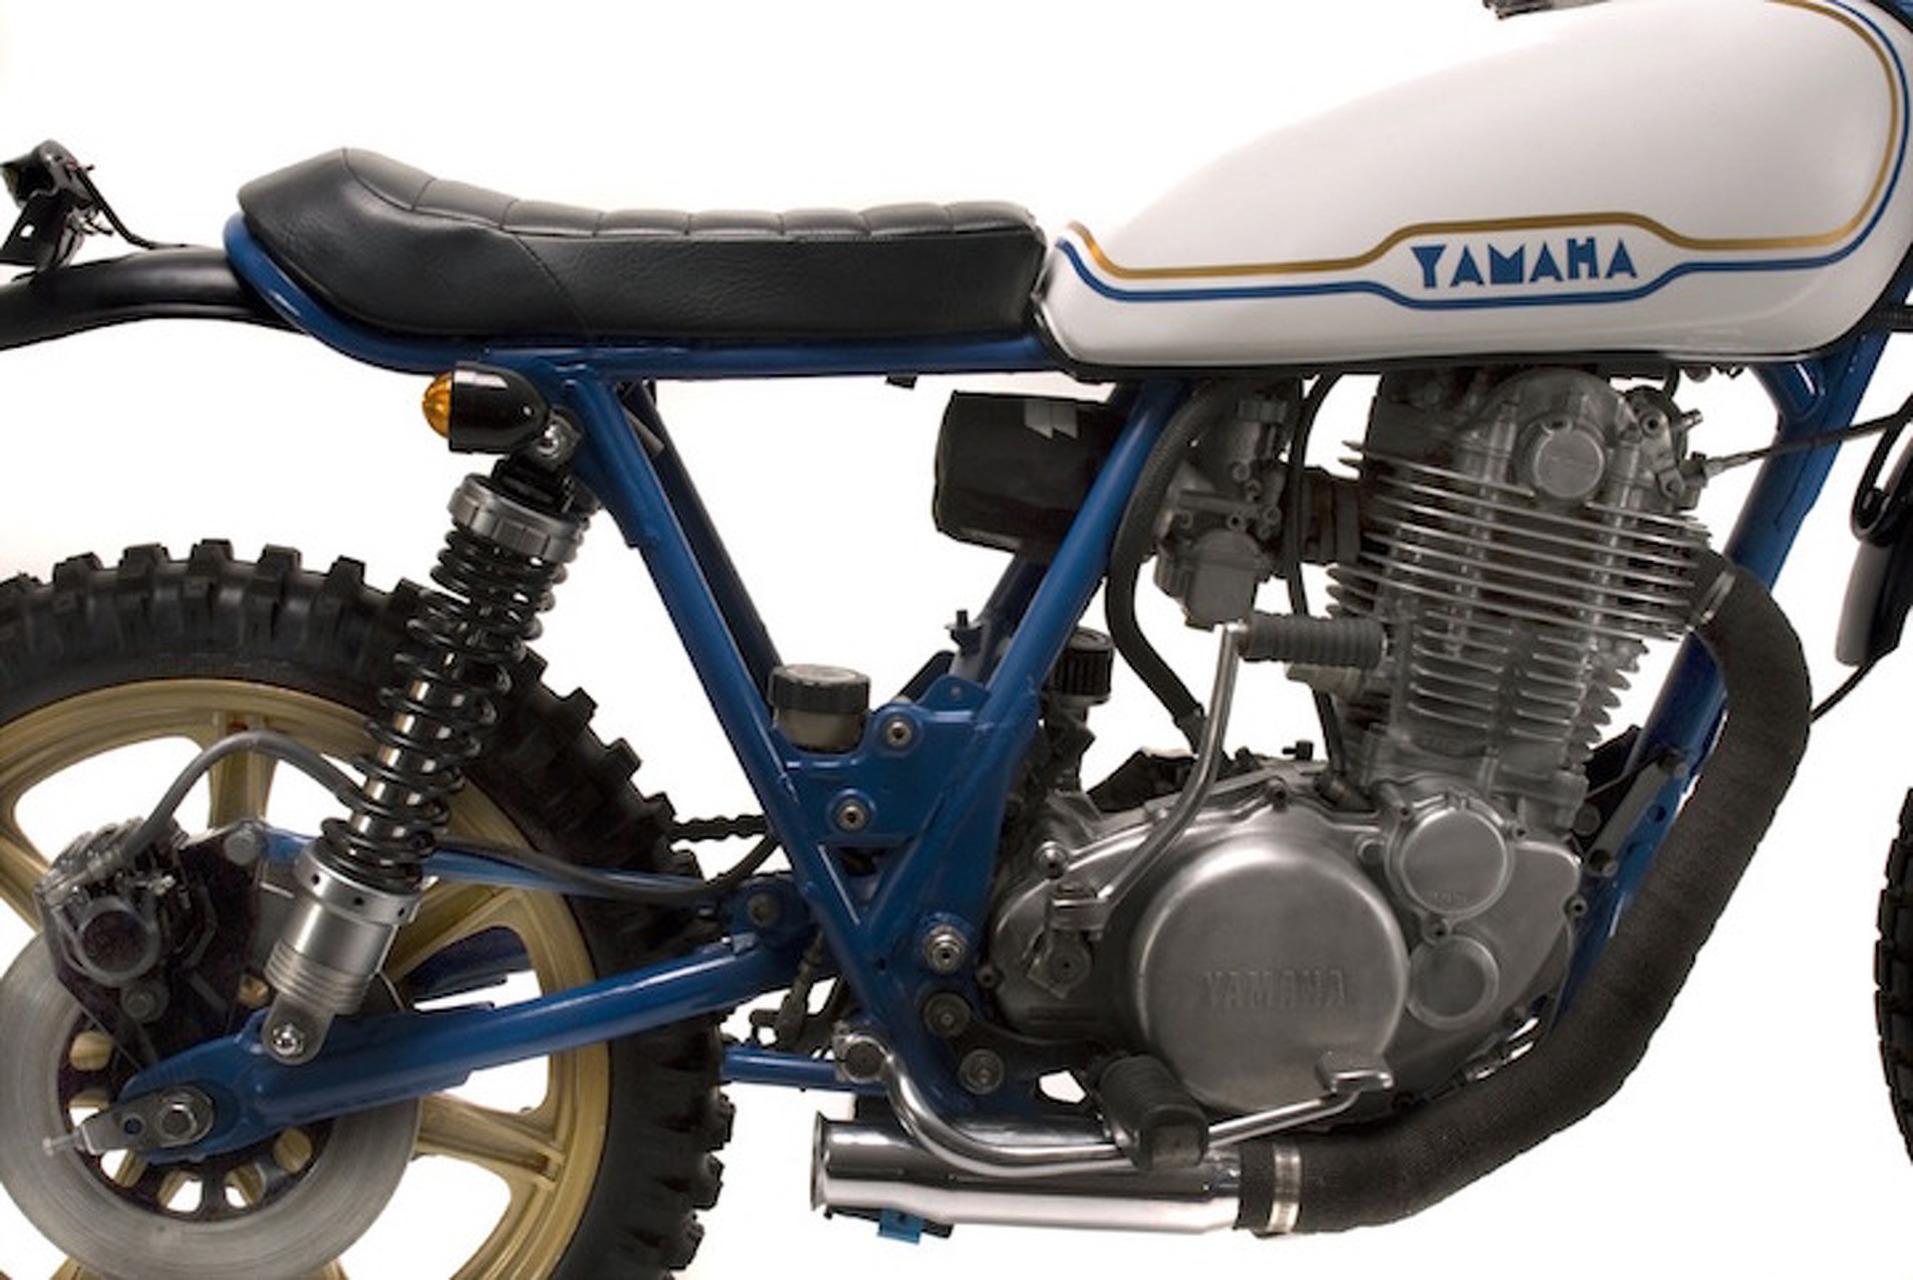 This 1978 Yamaha SR500 Custom is a Beautiful Bargain